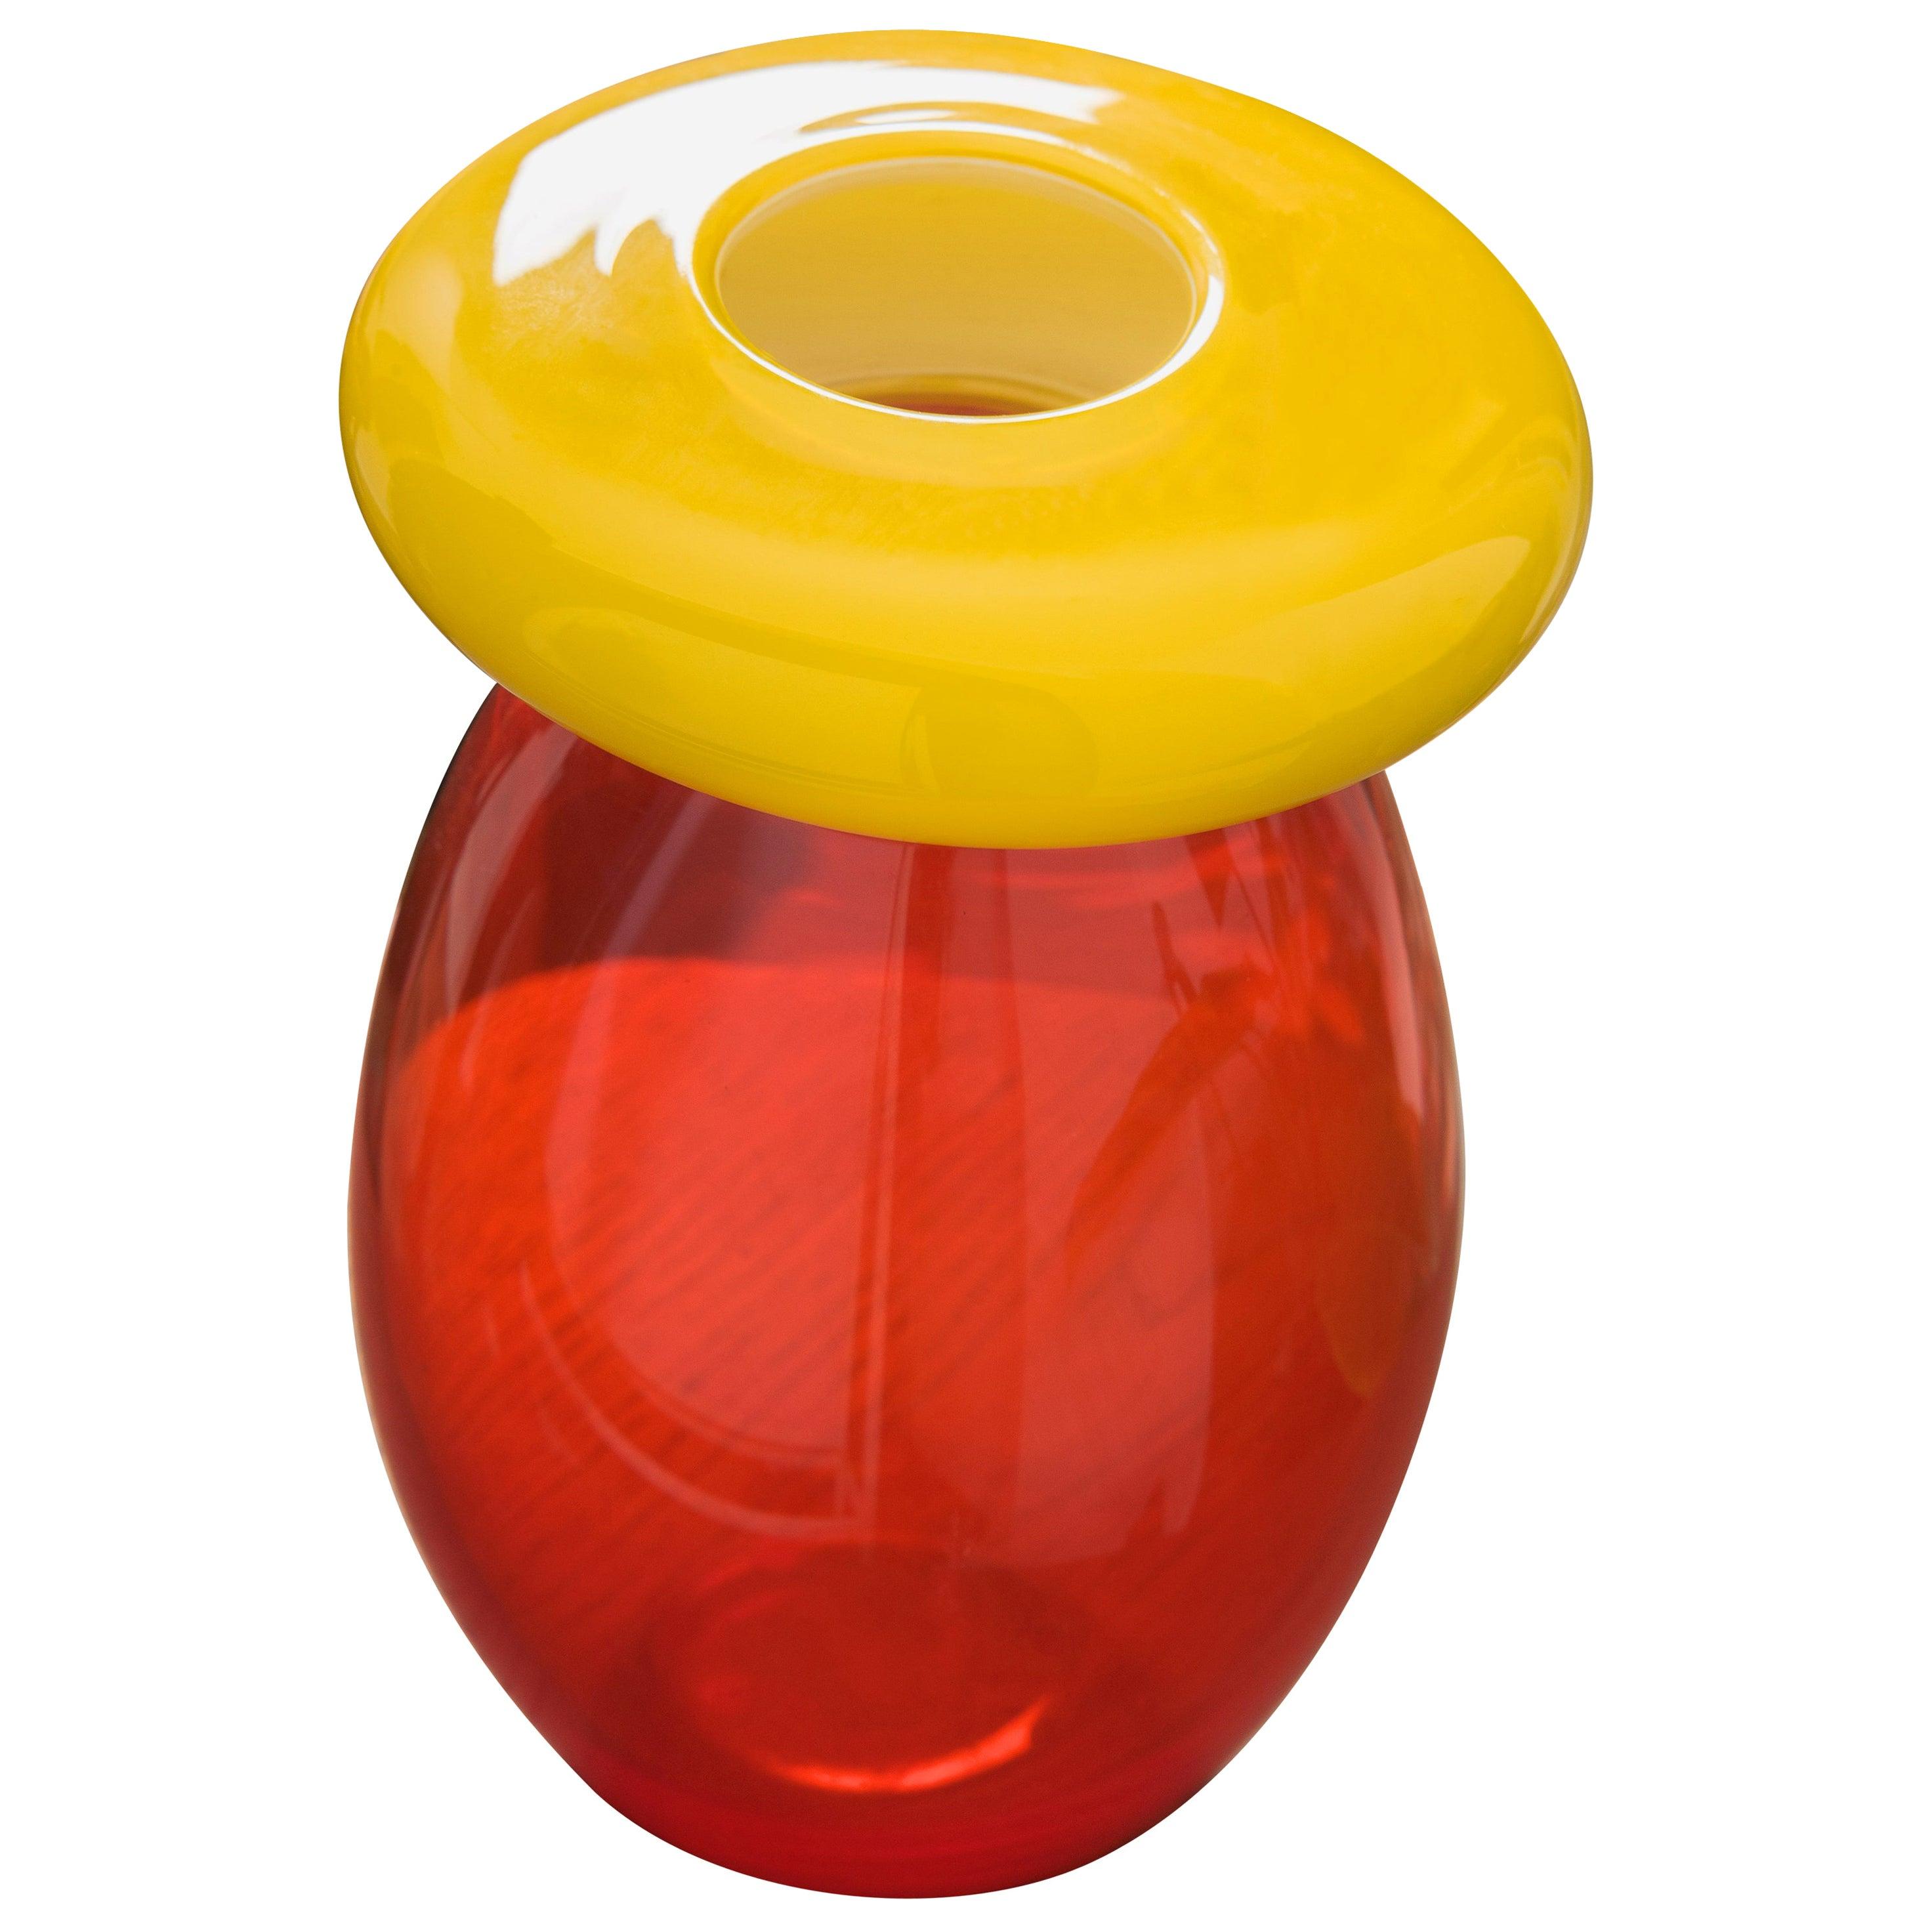 21st Century Karim Rashid Queen Vase Murano Glass Various Colors